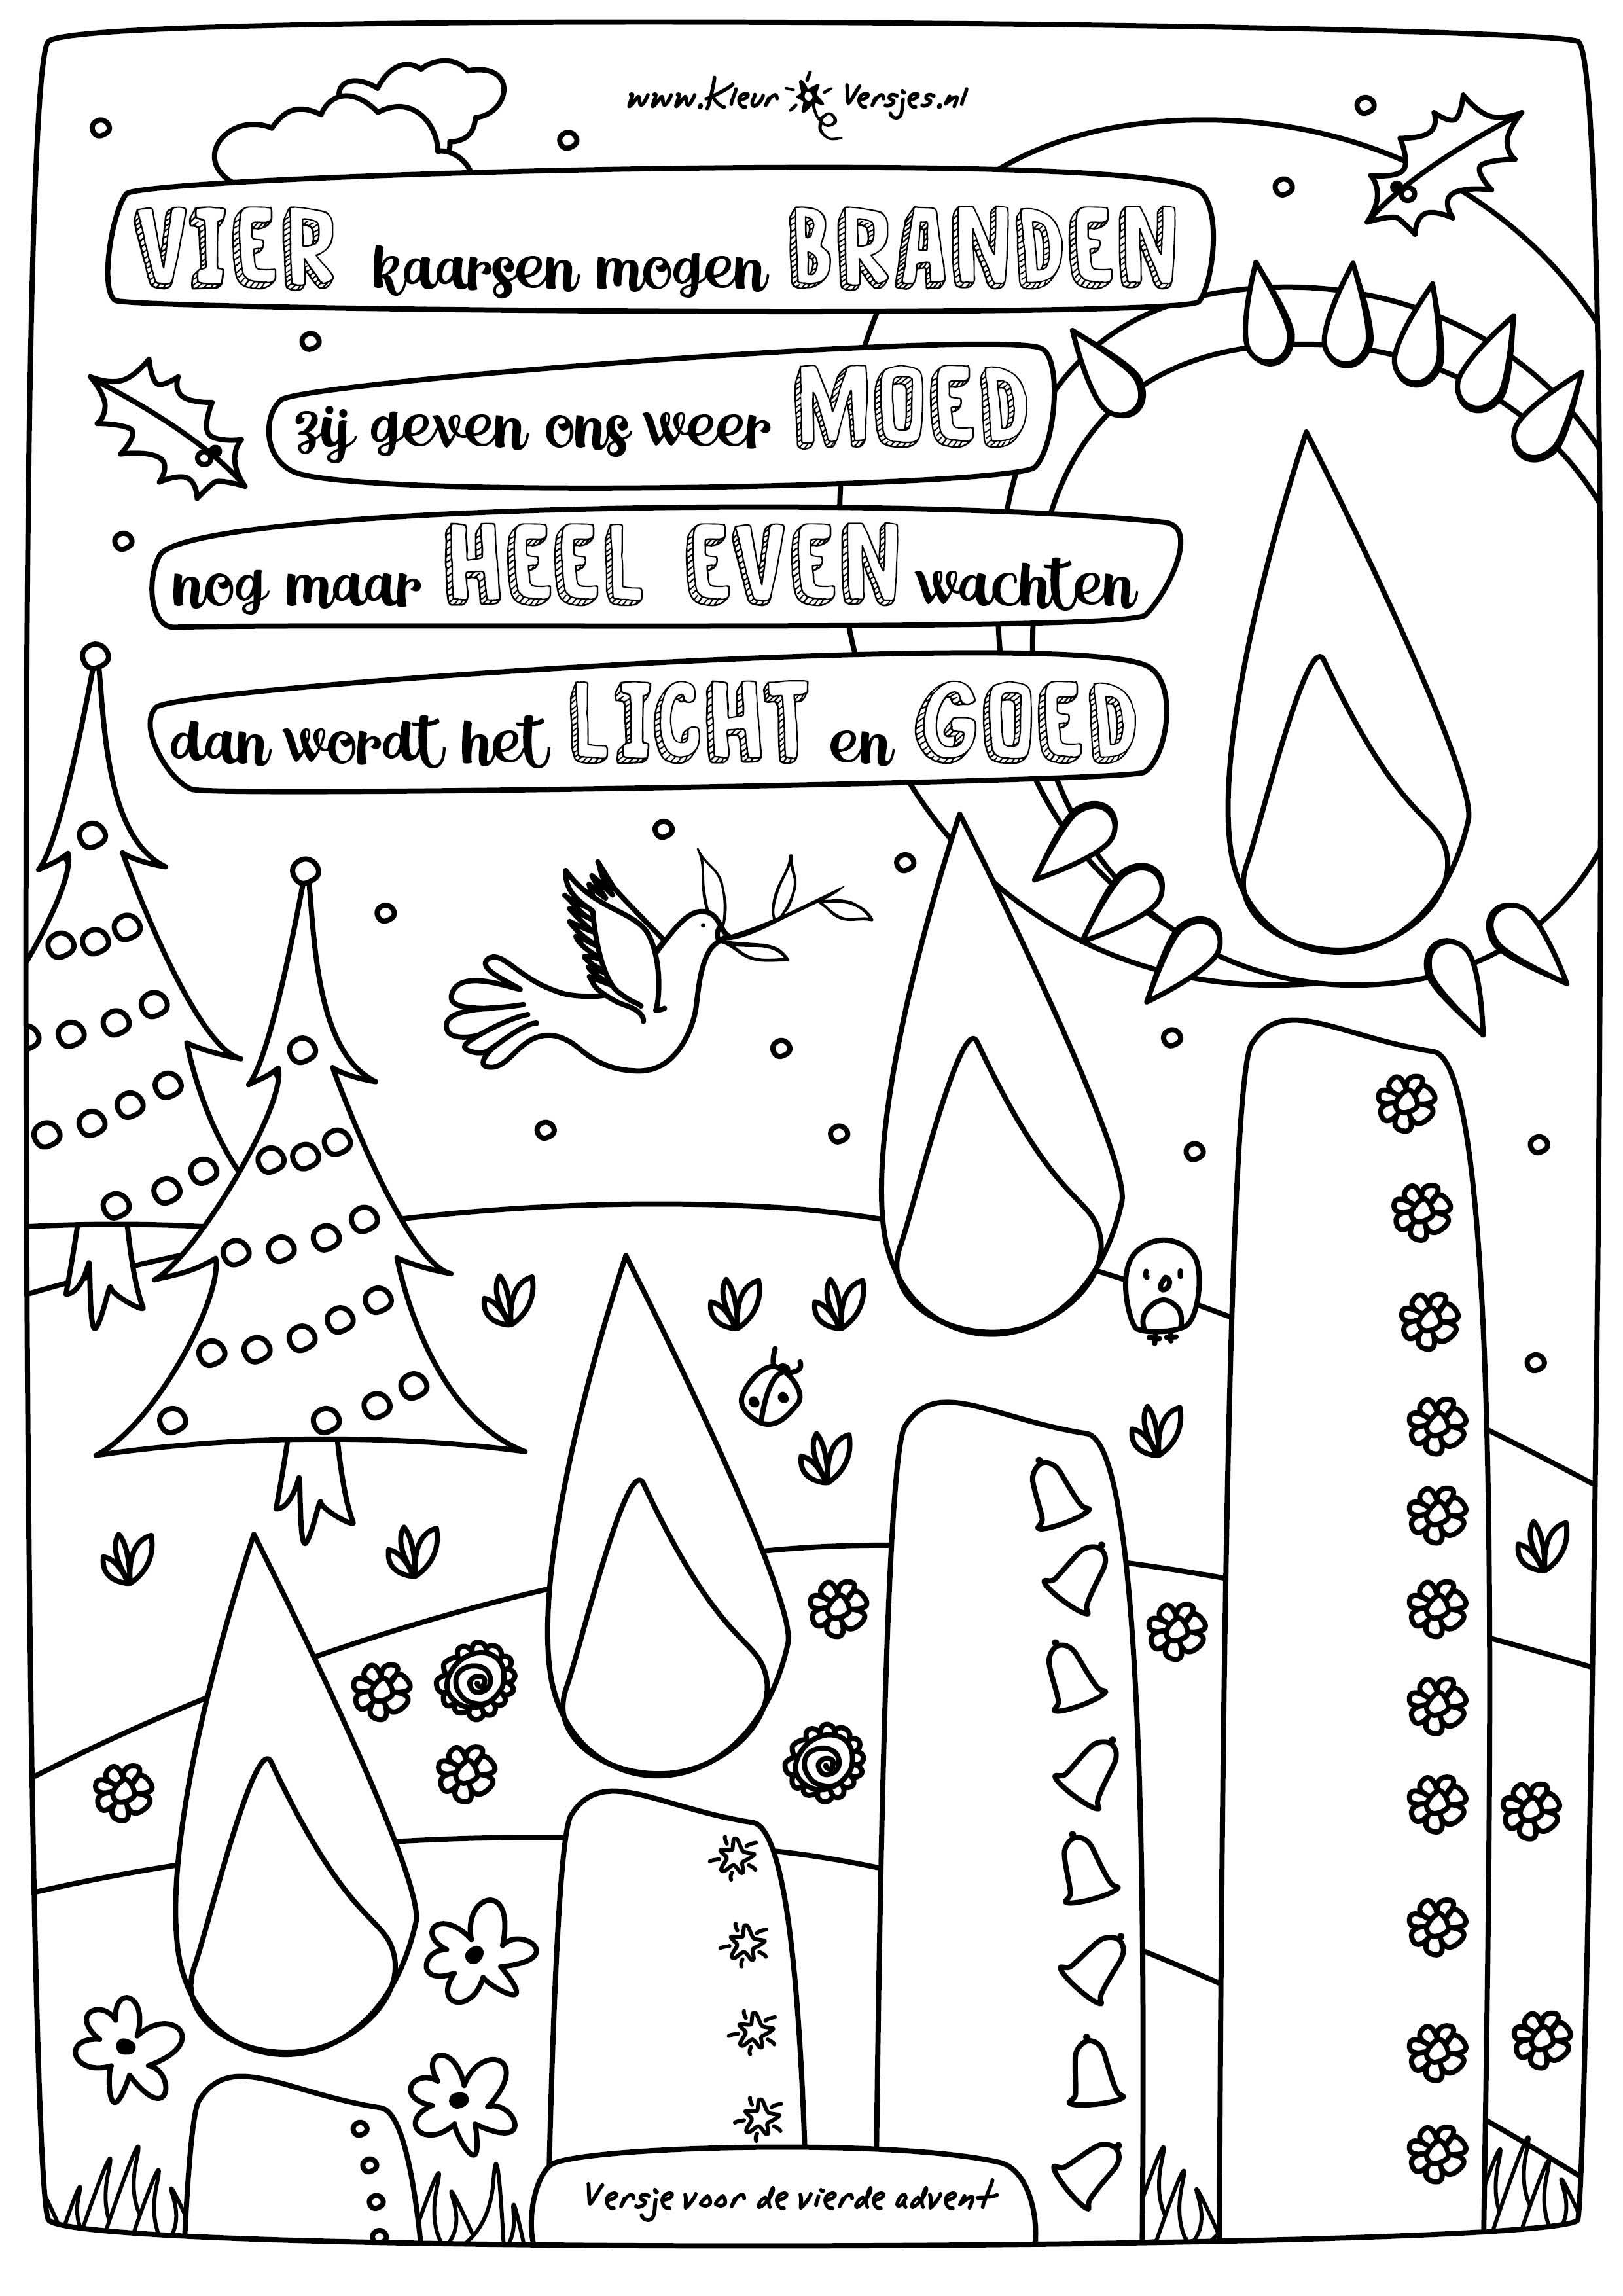 Gedichten Kleurplaten.Gedicht Archieven Kleurversjes Nl